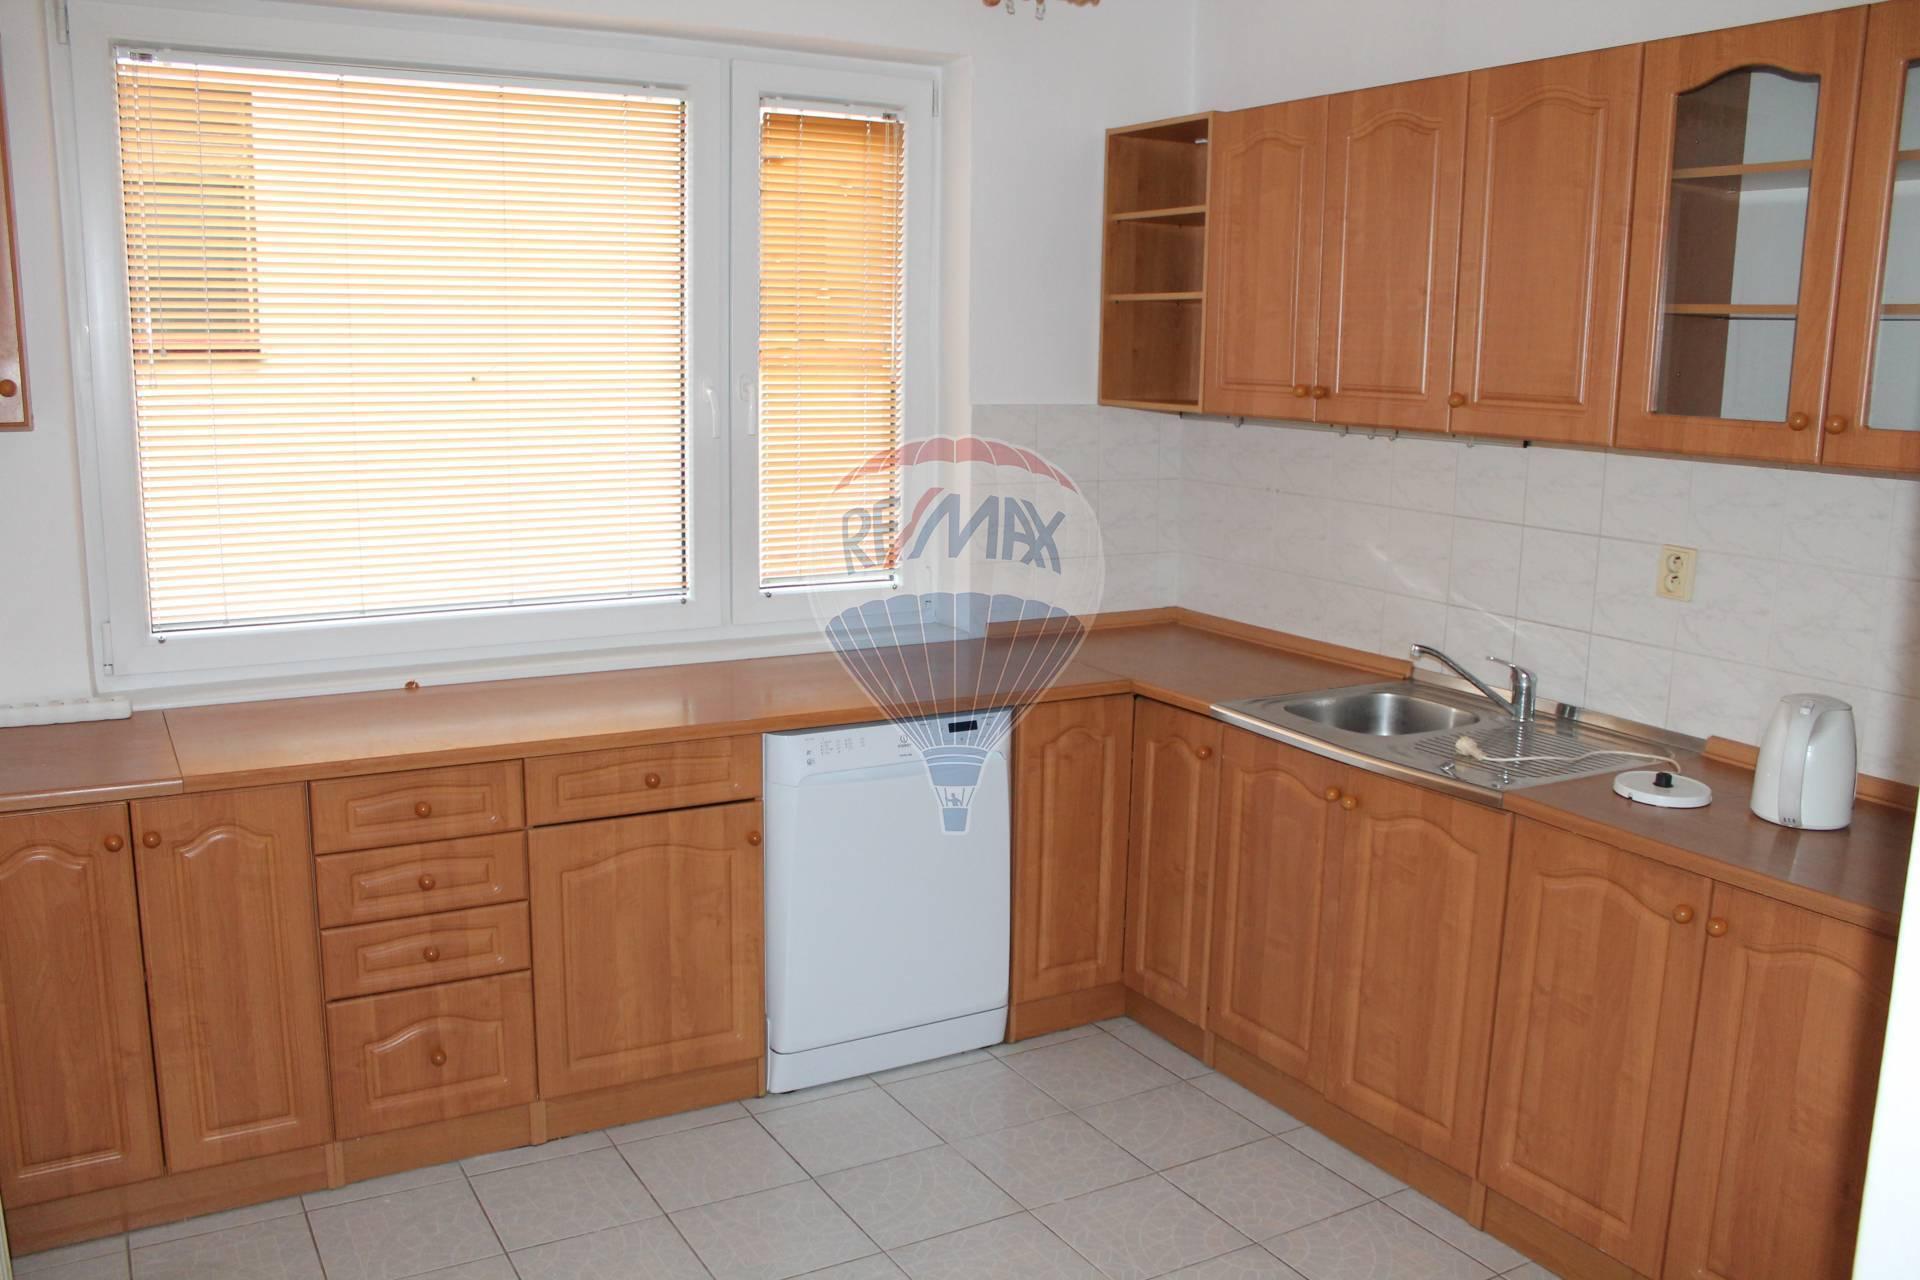 PRENÁJOM 3 ib. byt, mezonet 120 m2, A.Sládkoviča , Senec.